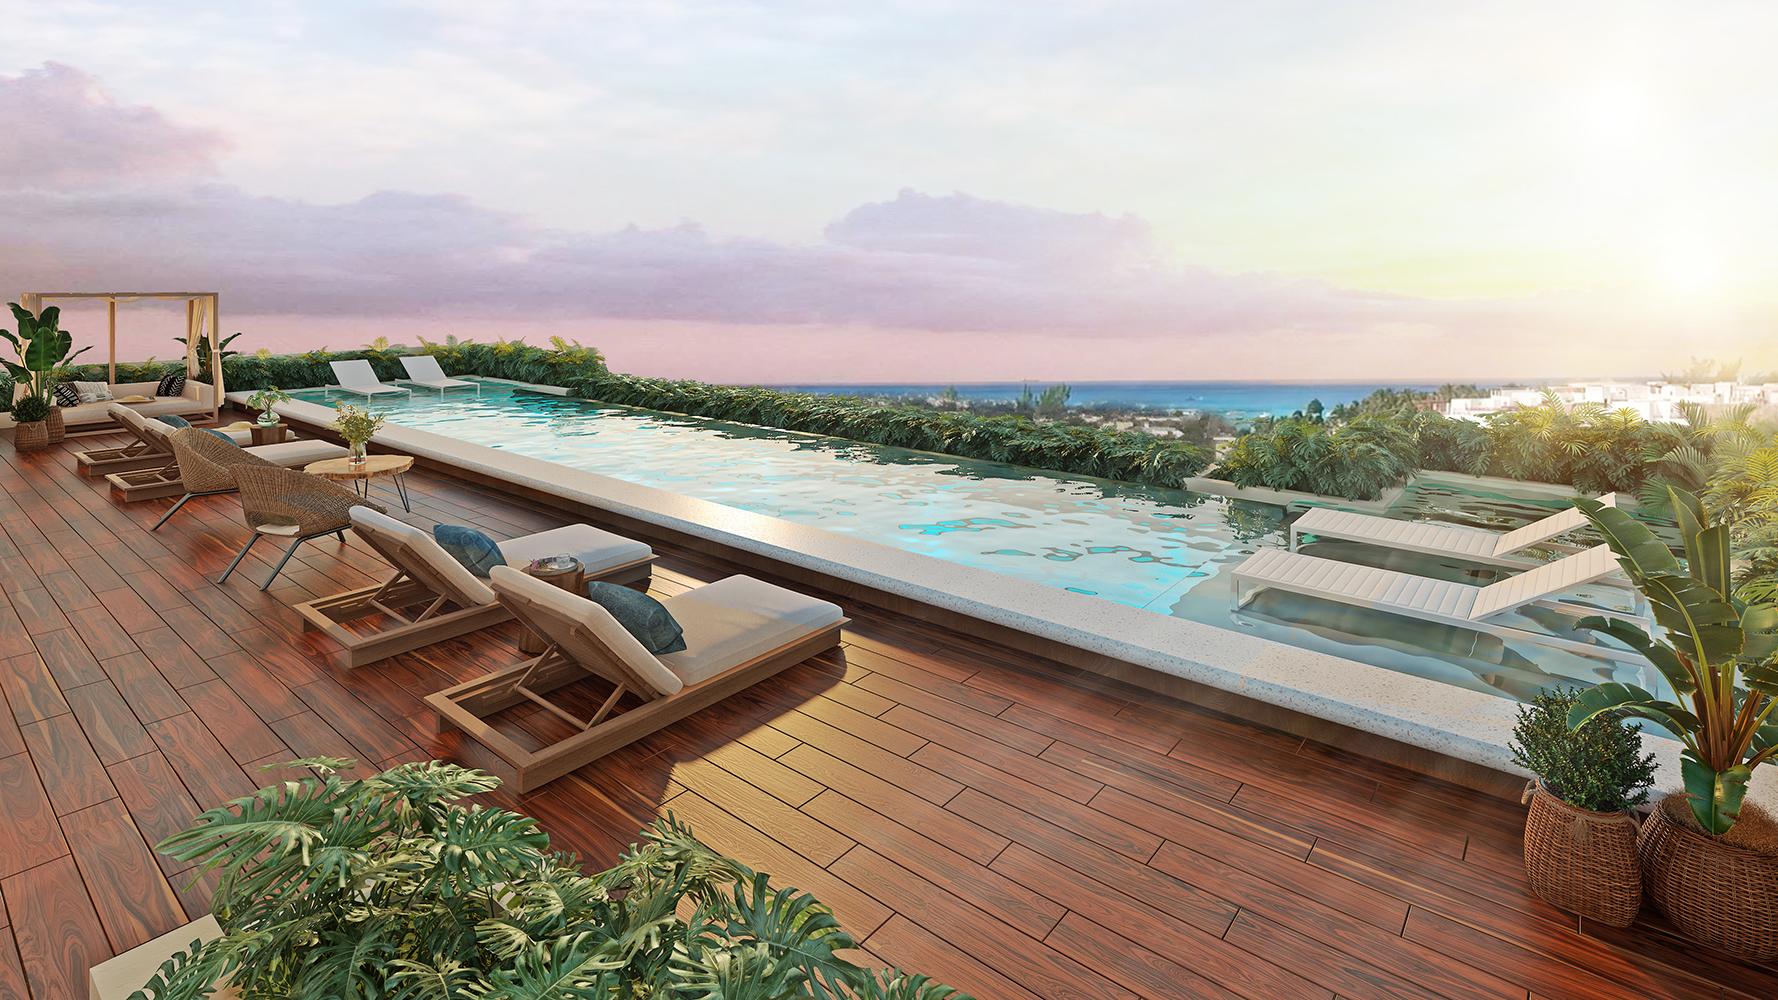 PISCINA 2- Paravian - Pelicano Properties - playa del Carmen